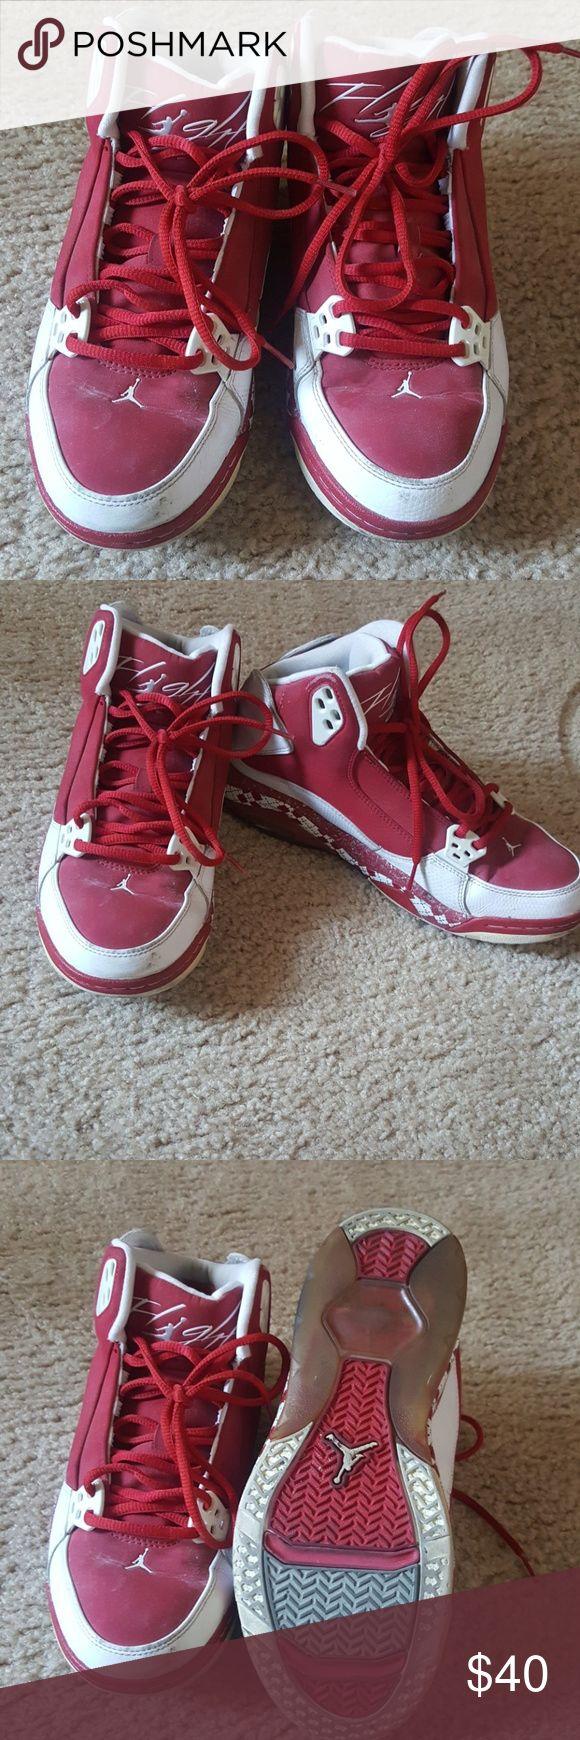 Jordan flight Normal wear has been stitting in closet collecting dust Jordan Shoes Sneakers